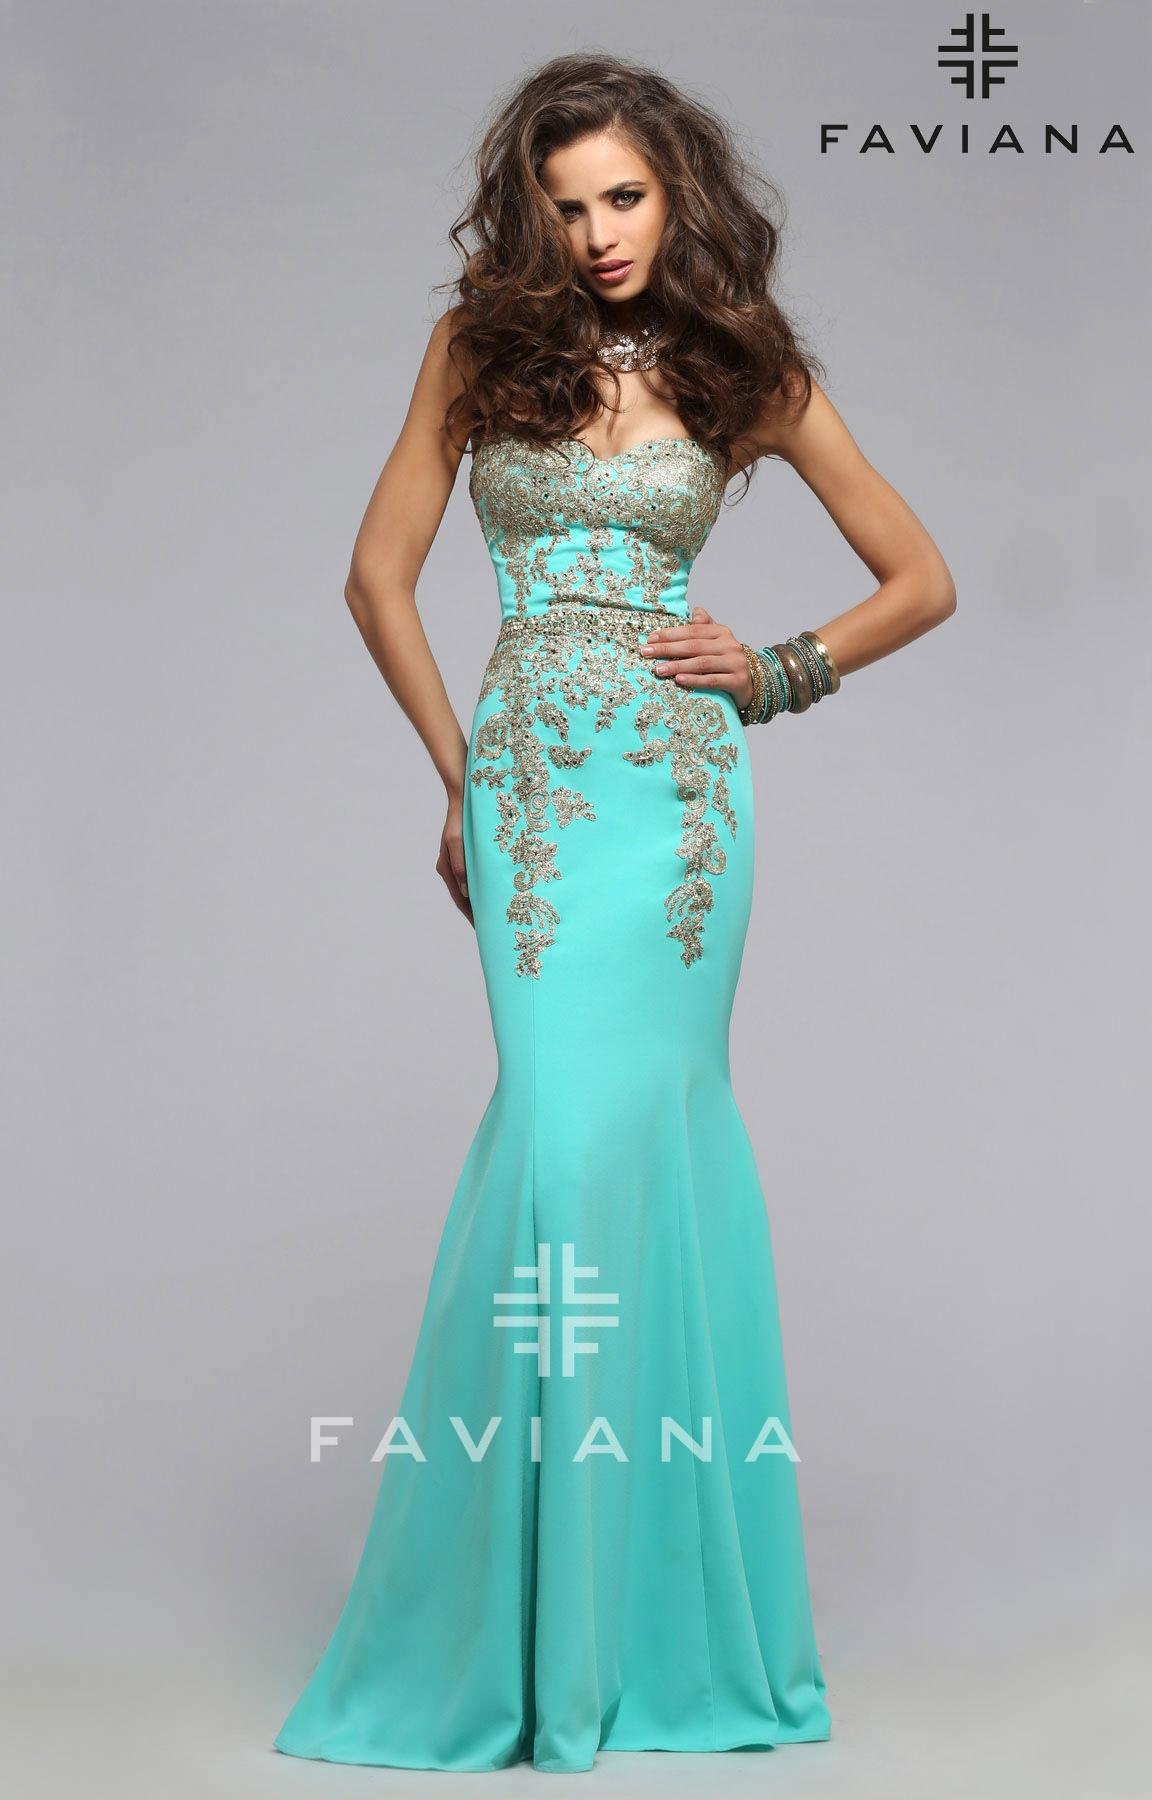 Faviana S7796 - Meet Me in the Garden Dress Prom Dress